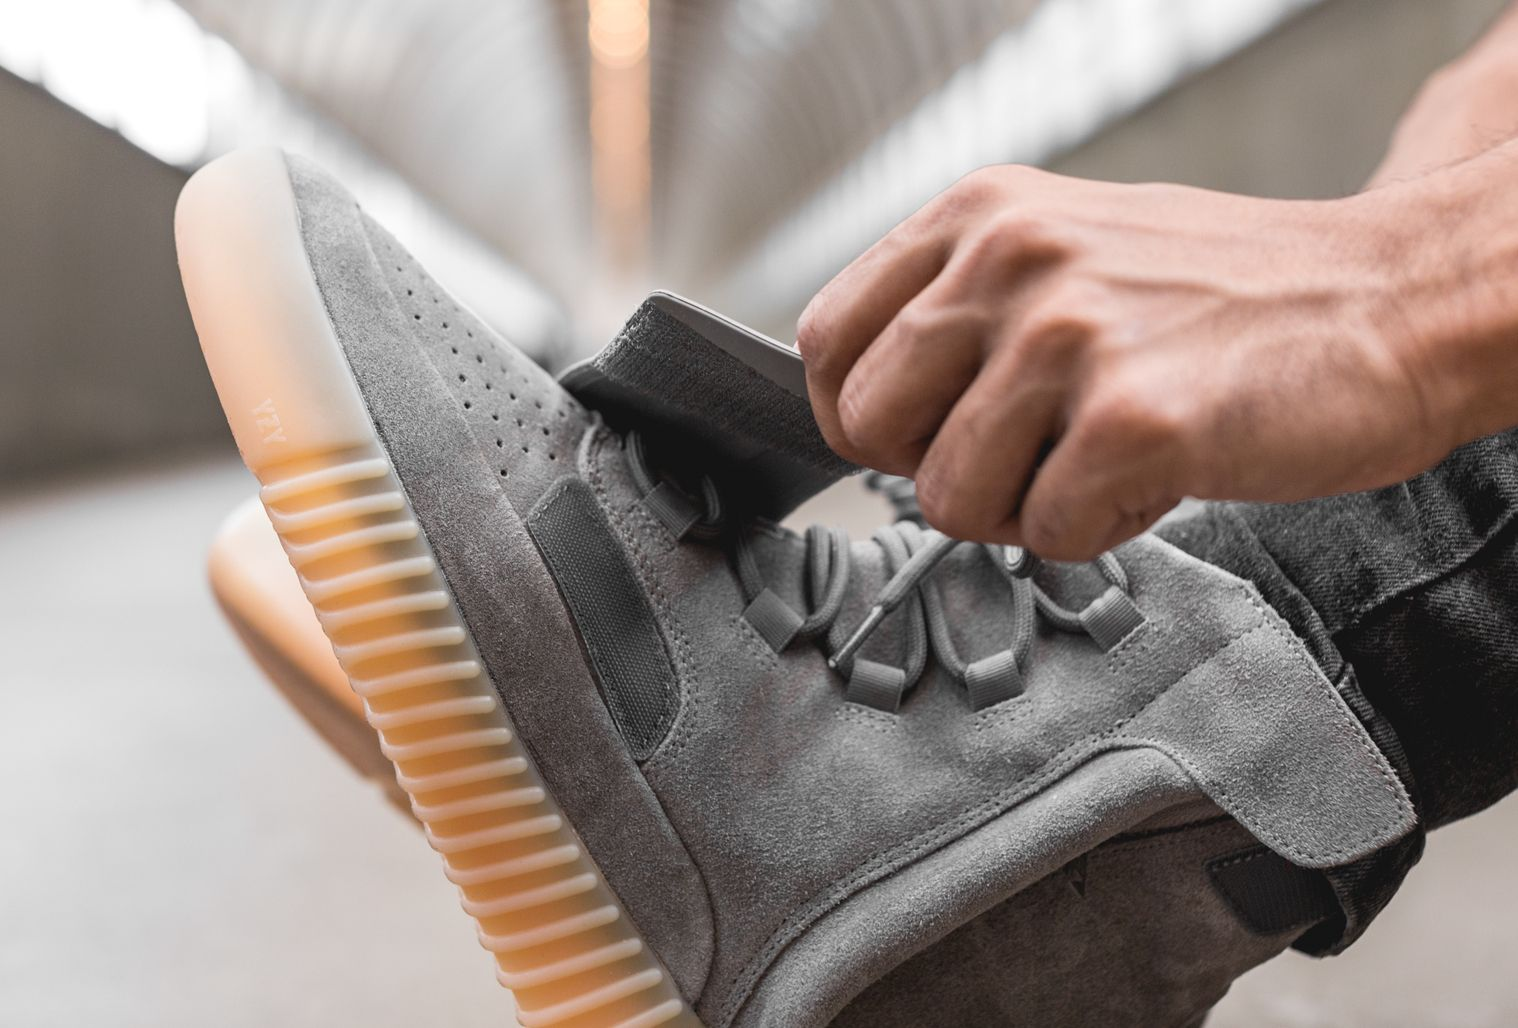 Kanye West x Adidas Yeezy 750 Boost 'GreyGum' (glow in the